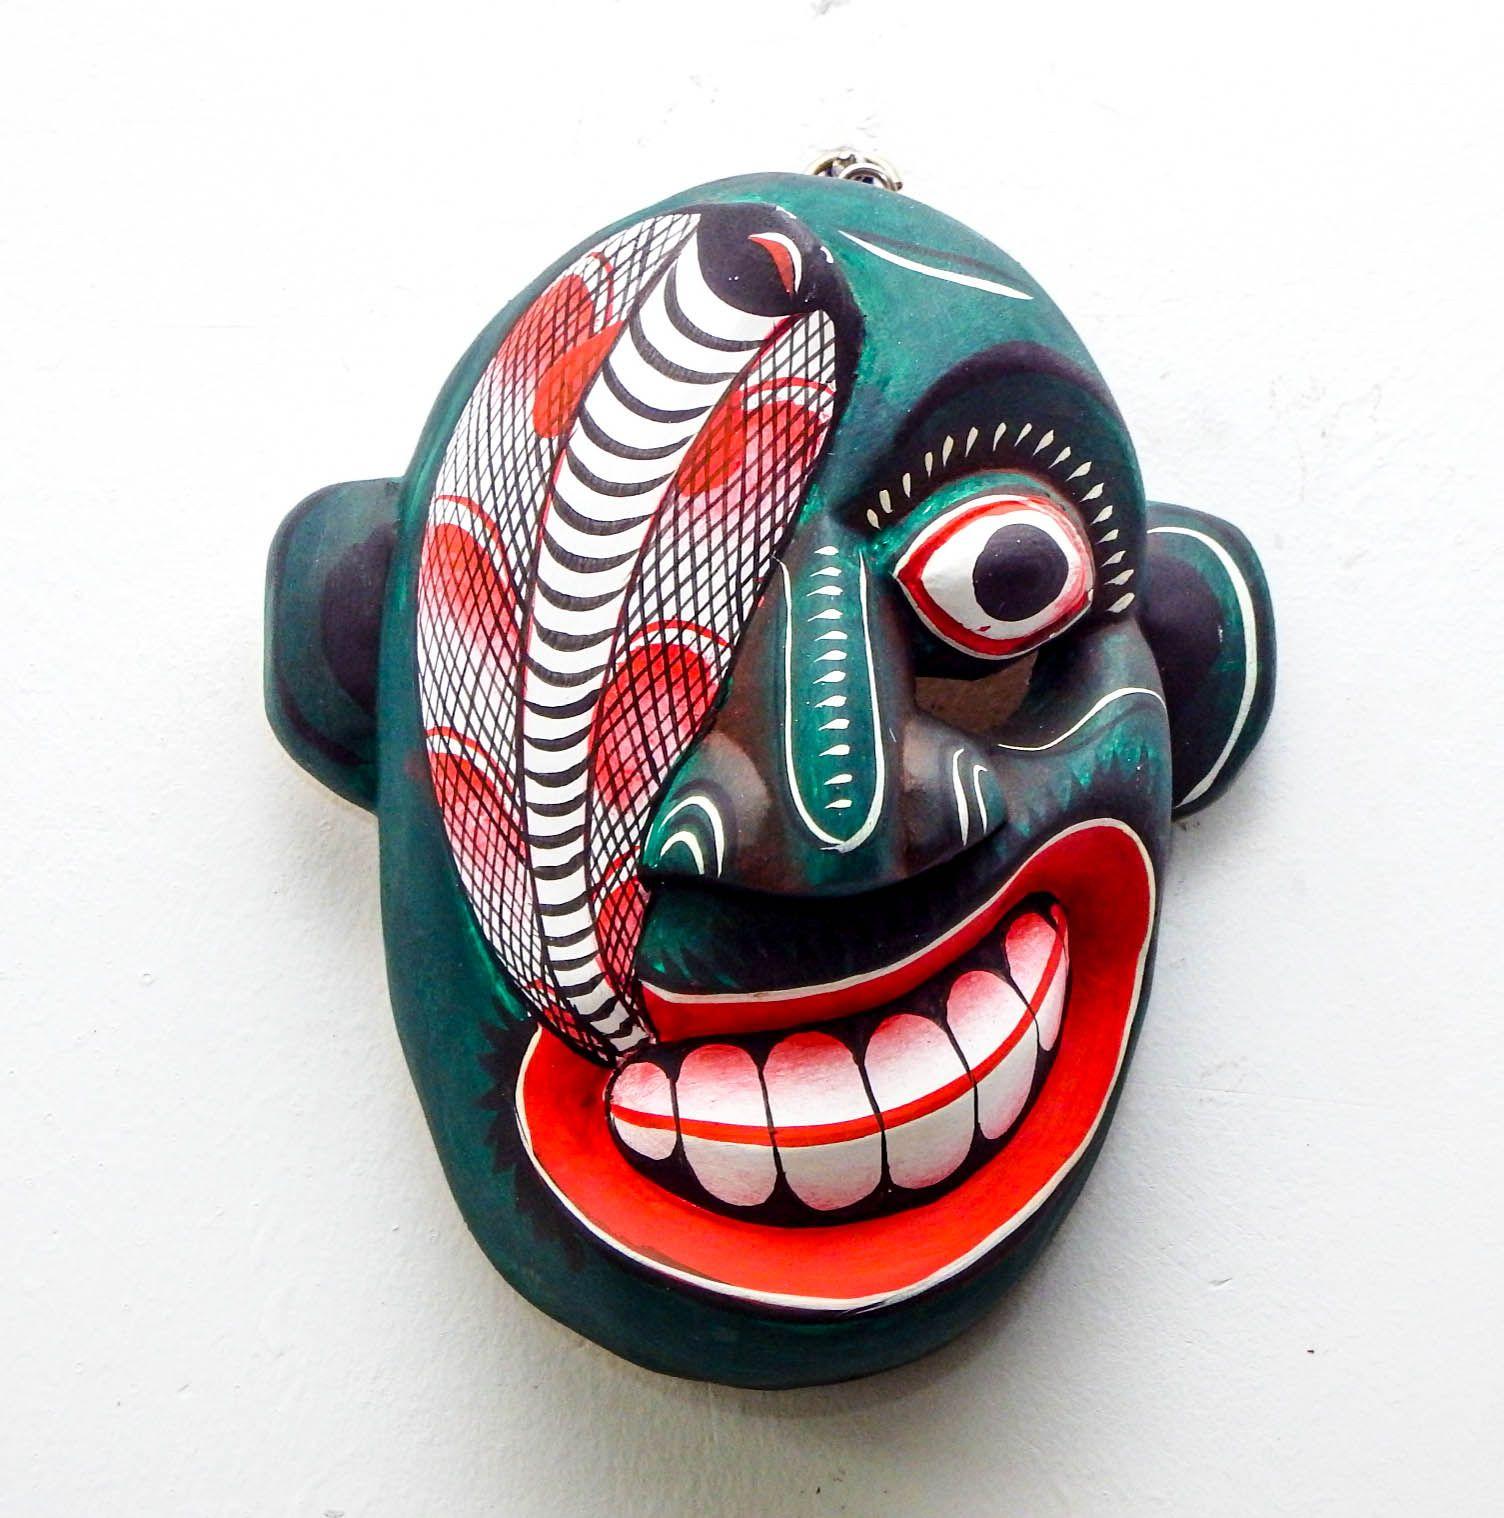 Pin on Sri Lankan Masks, Sculptures & Crafts